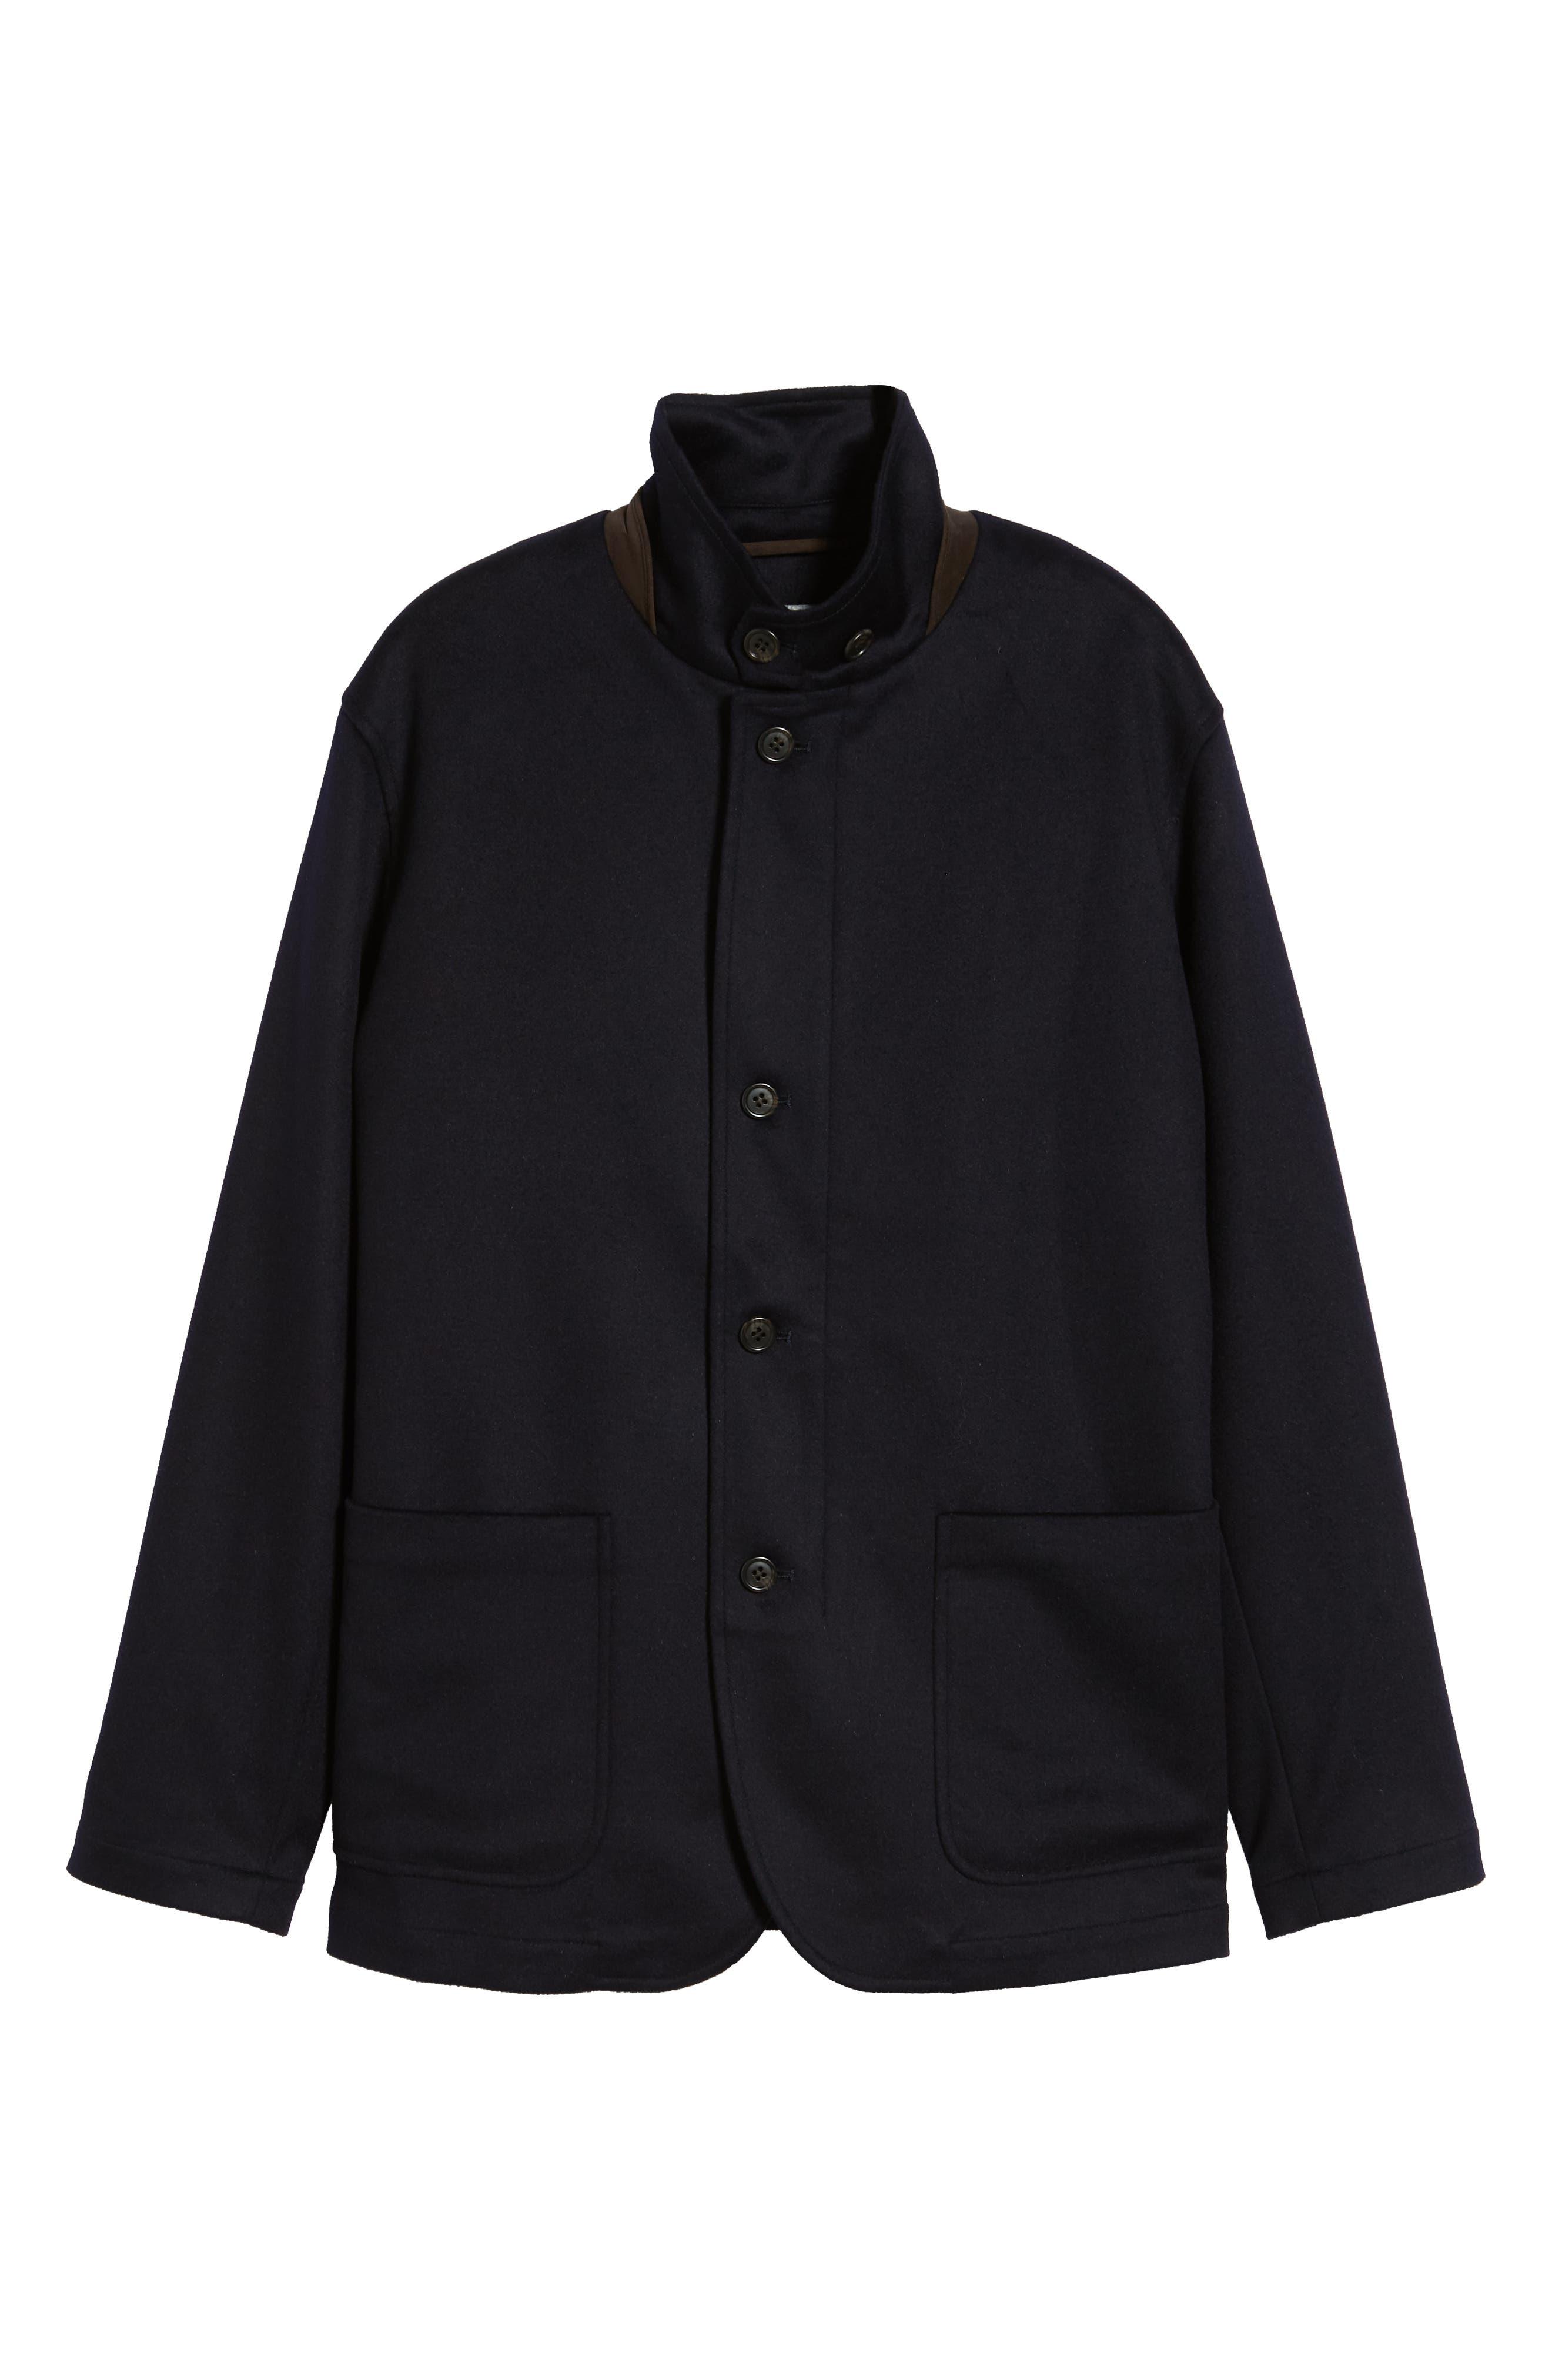 Wade Crown Fleece Jacket,                             Alternate thumbnail 6, color,                             ARCTIC NIGHT